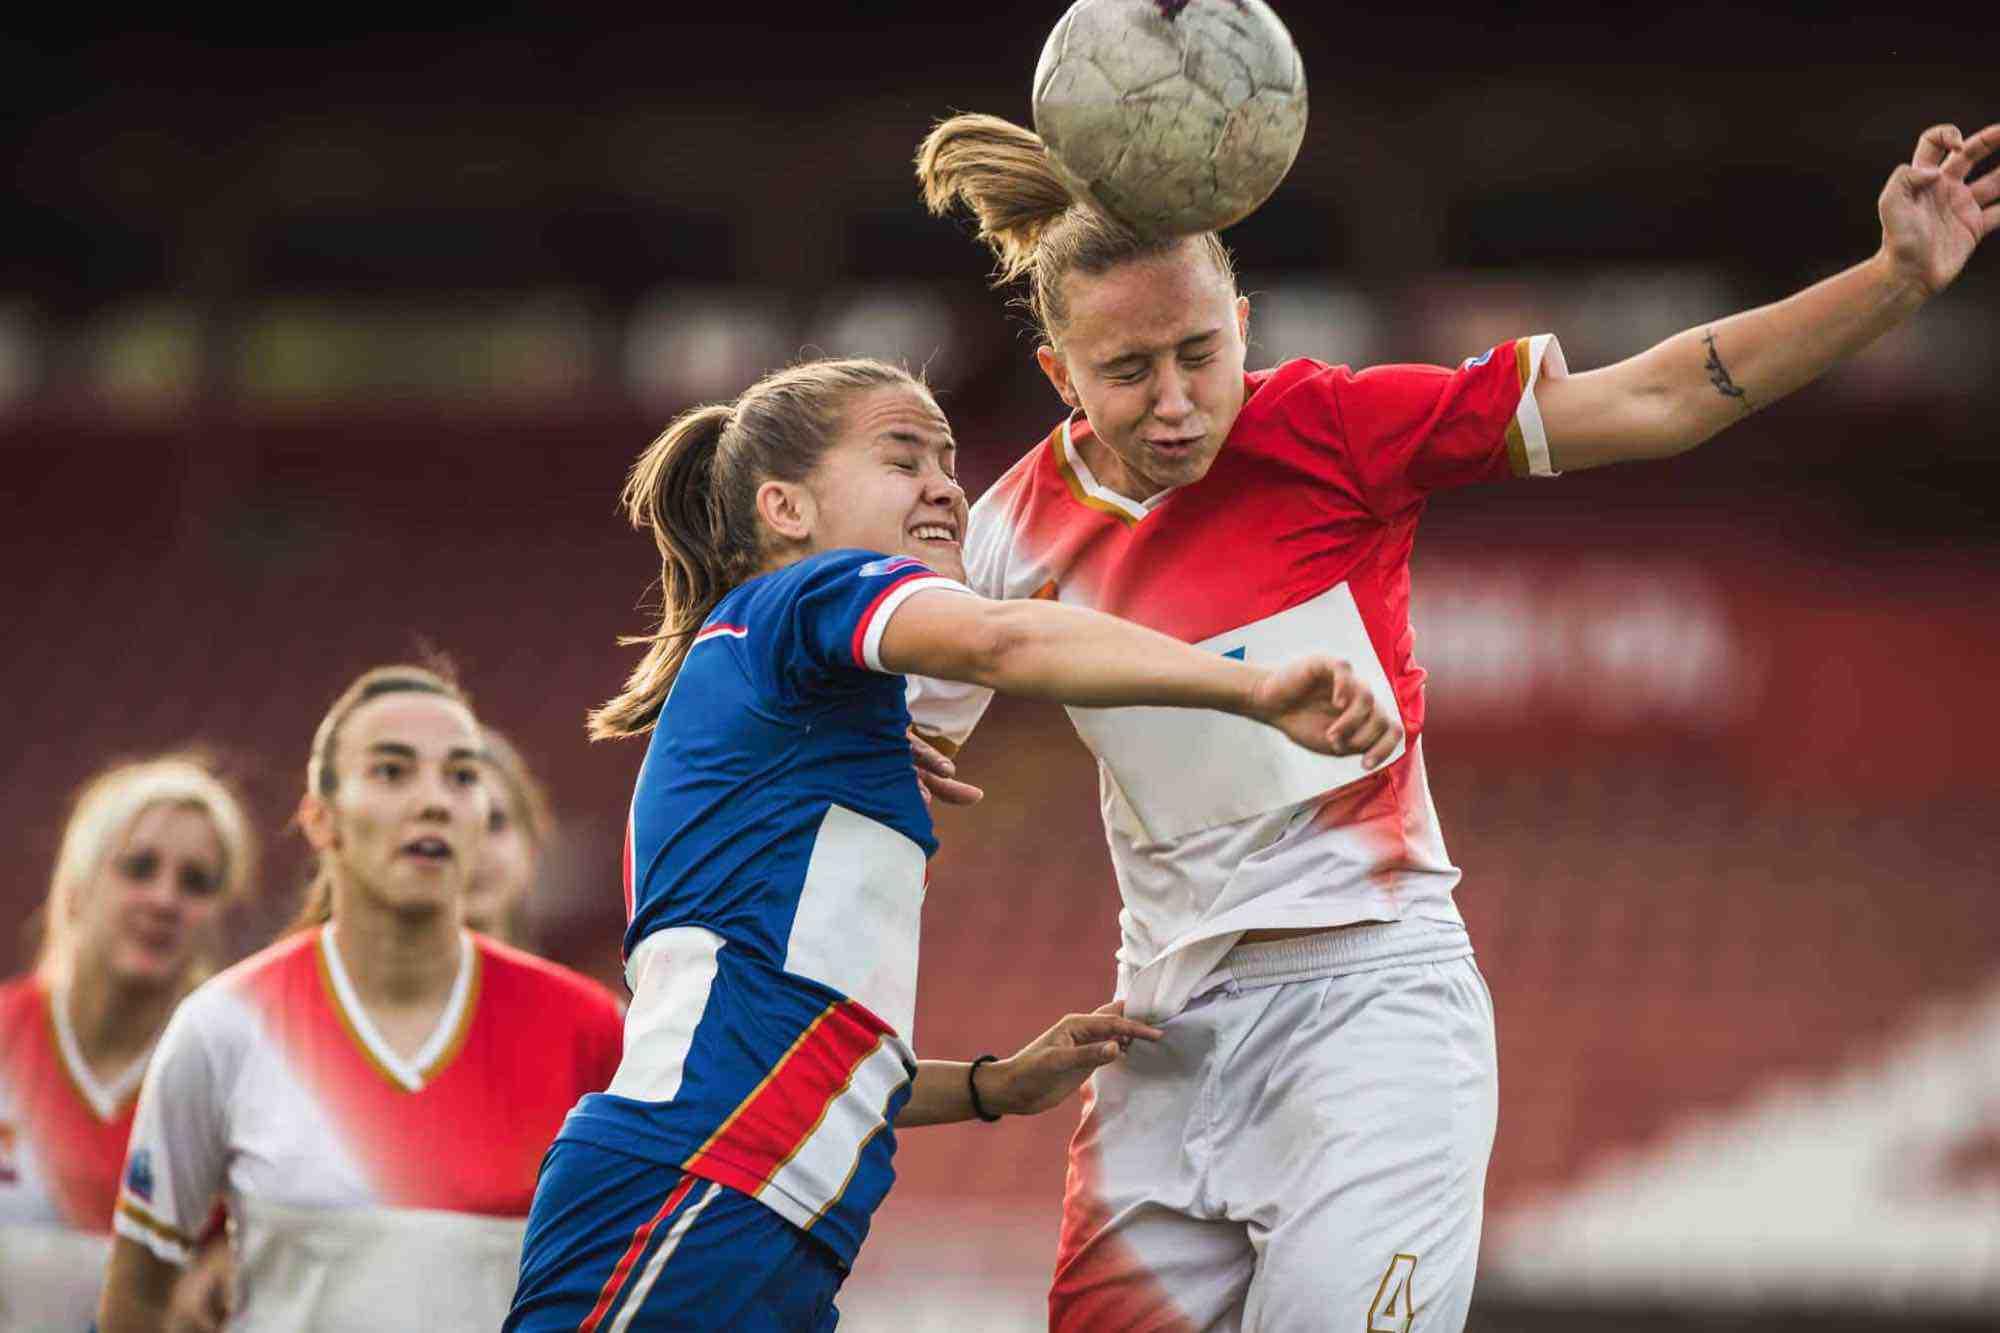 Teen girls soccer game; one girl using head to deflect soccer ball